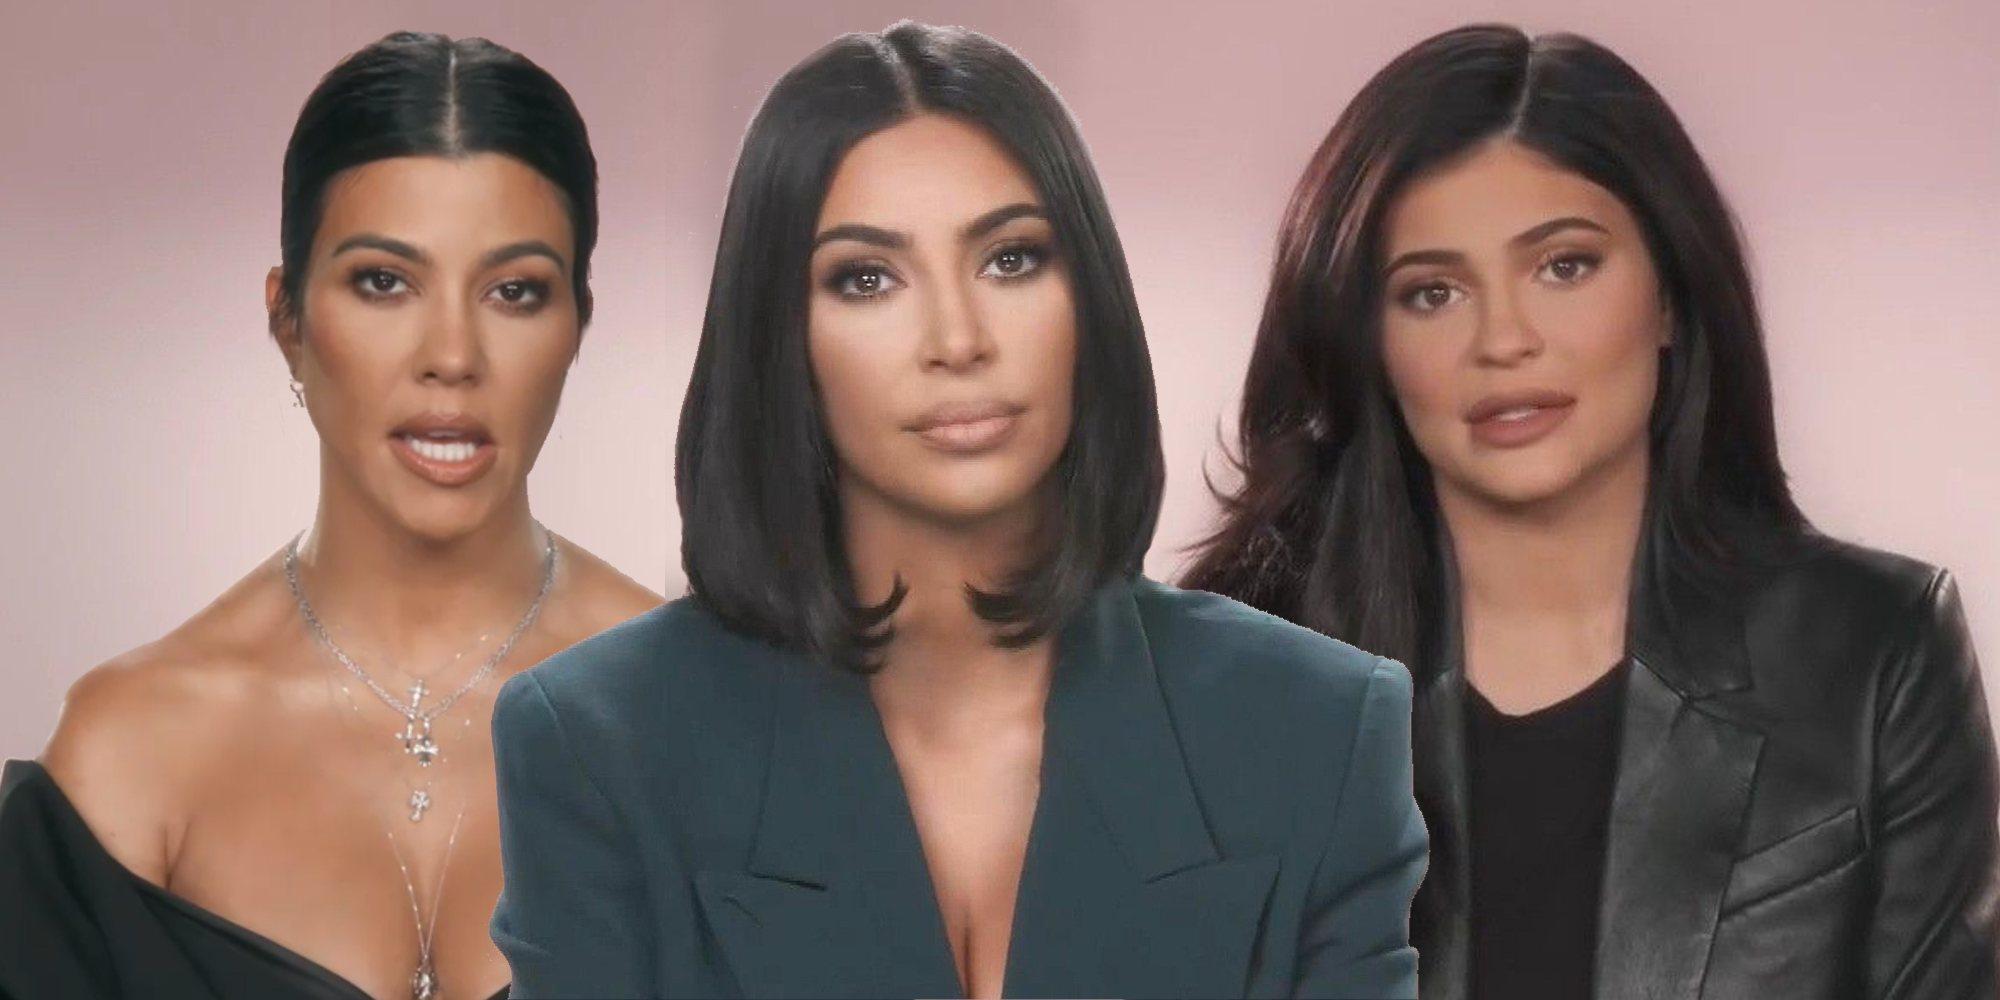 Kim, Kourtney Kardashian y Kylie Jenner, las causantes del fin de 'Keeping Up With The Kardashians'